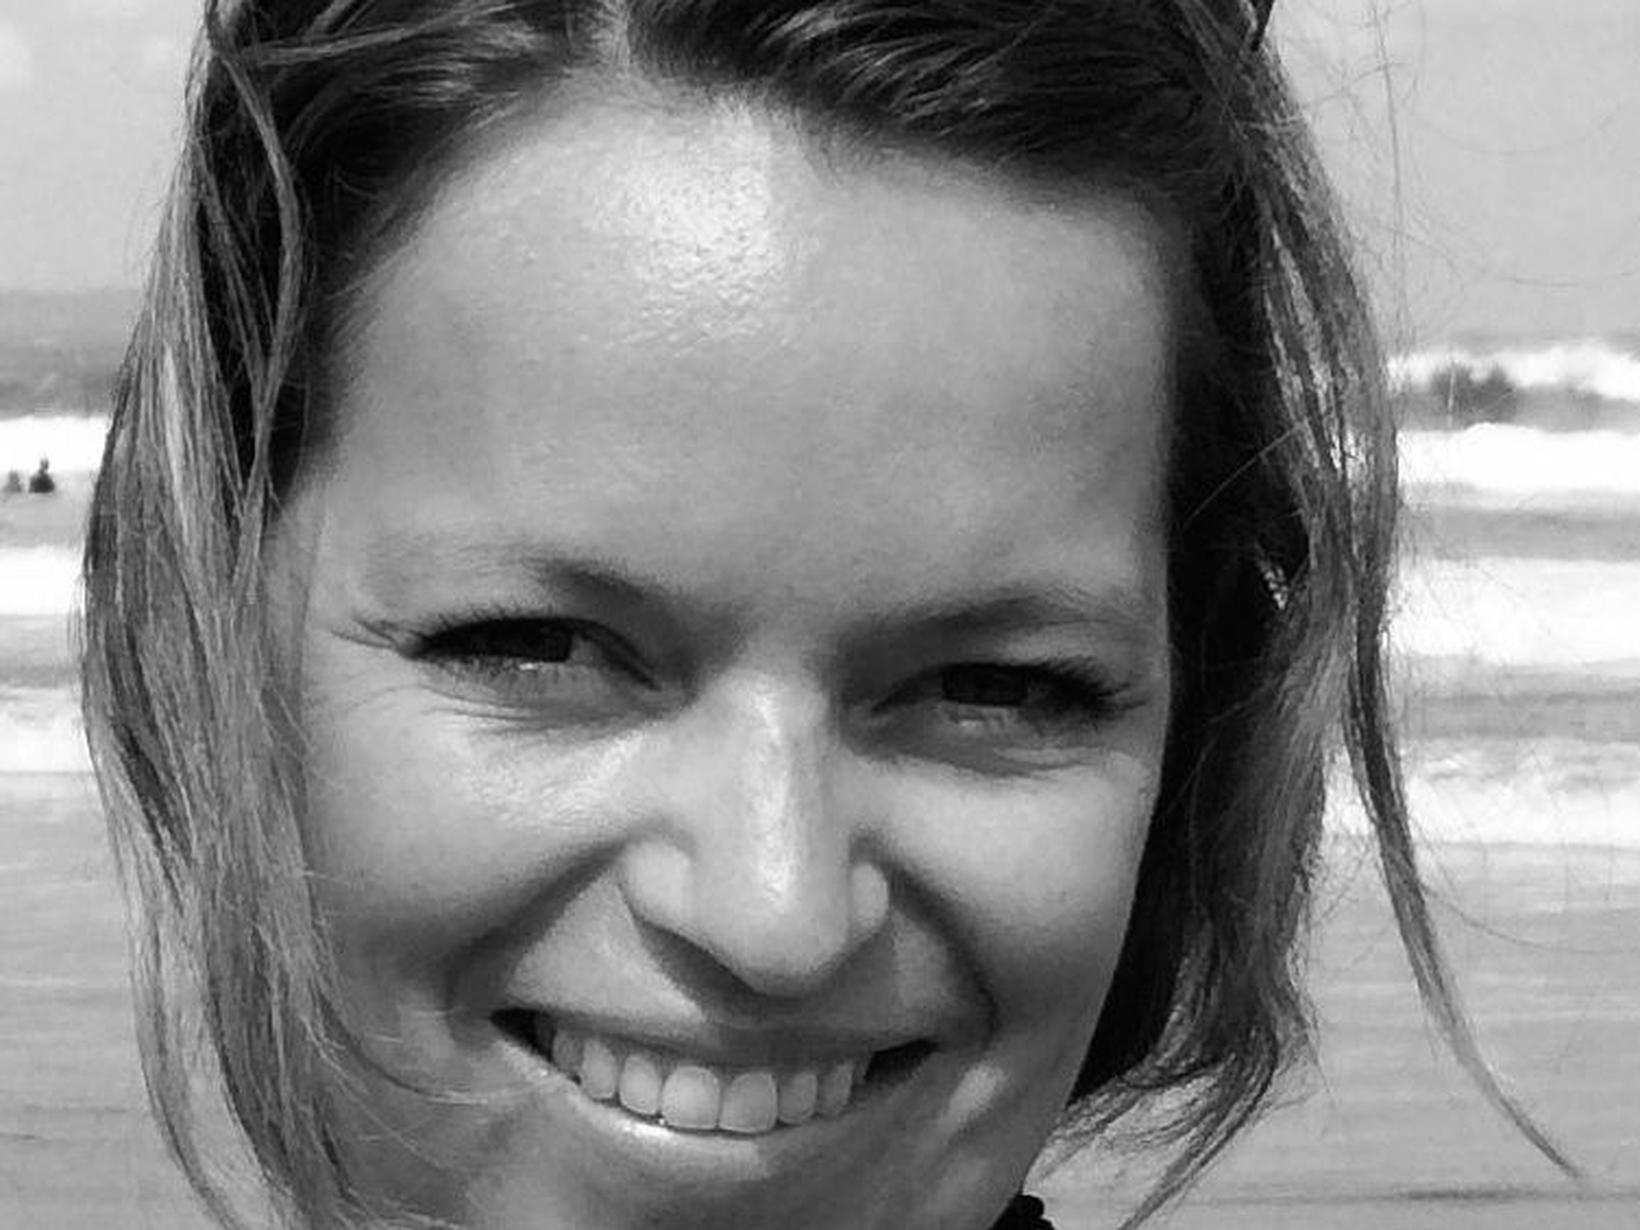 Kirsten from Breda, Netherlands